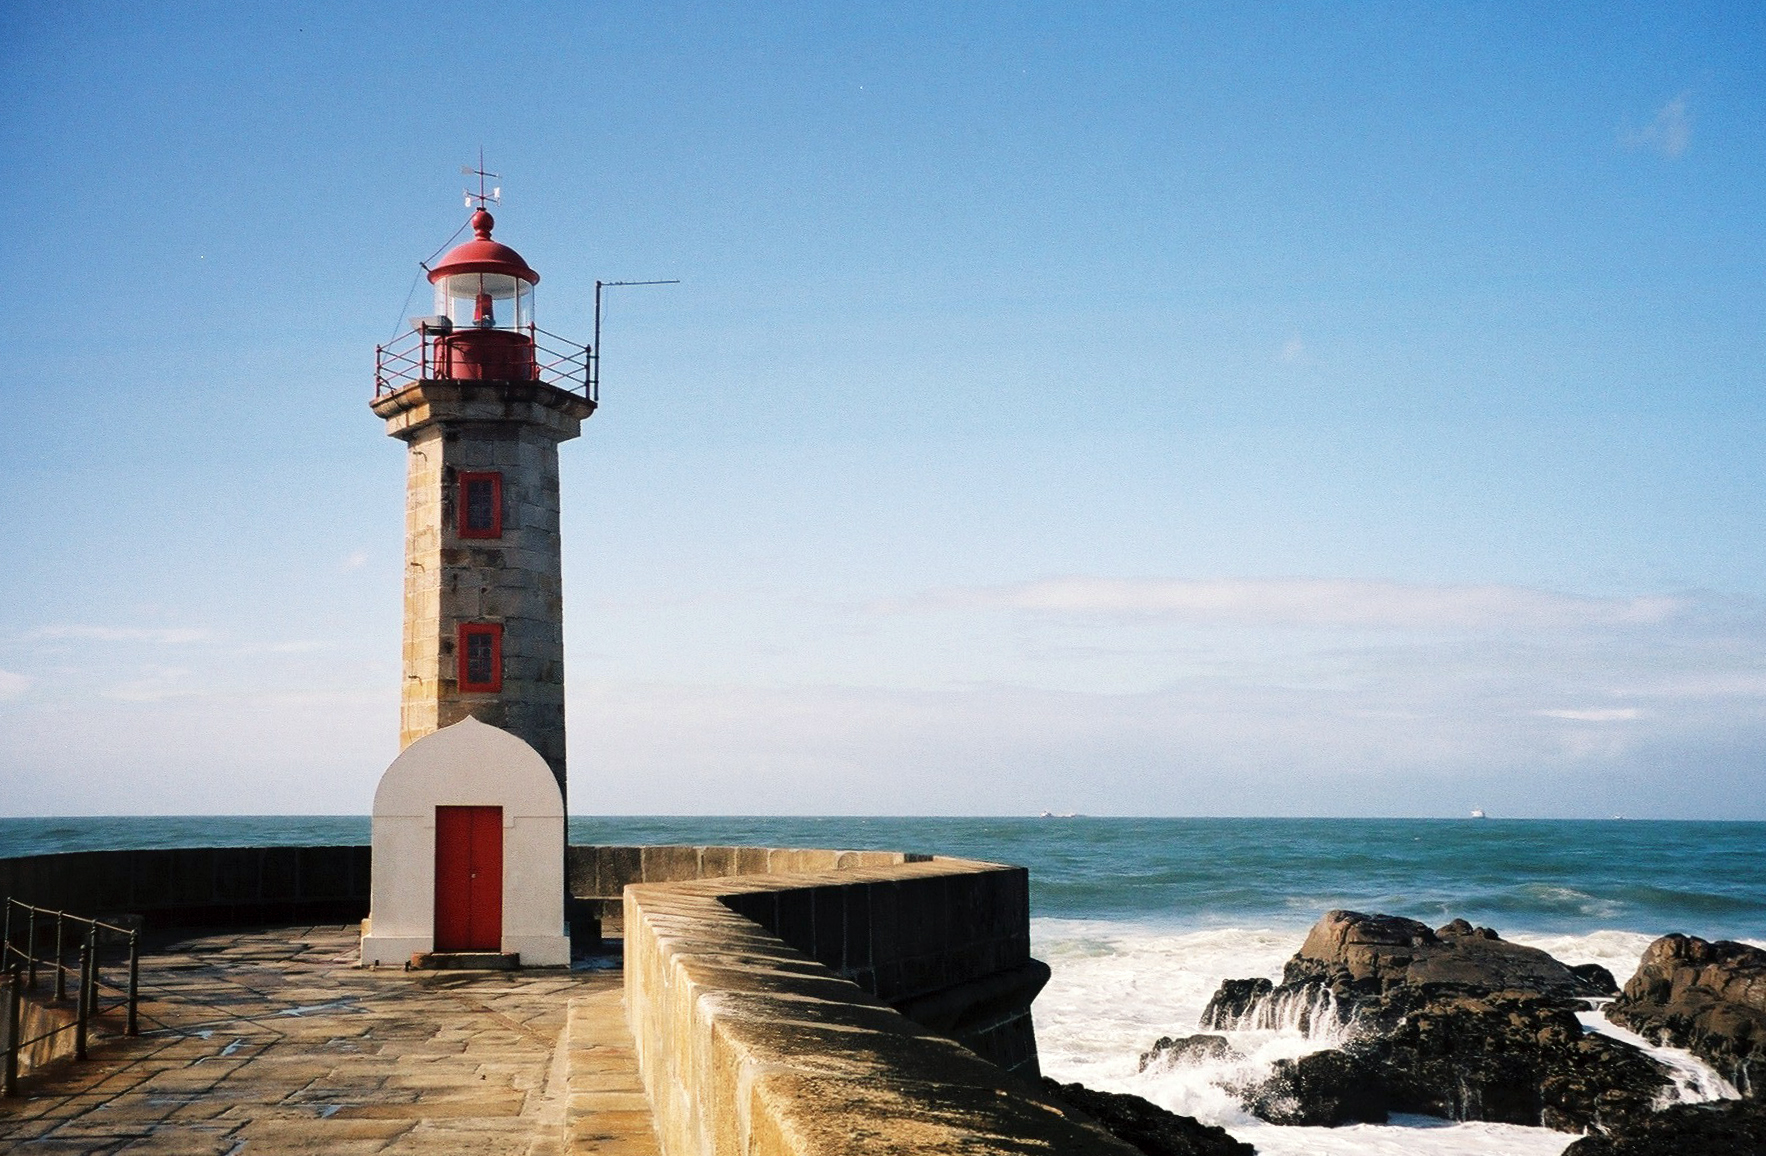 File:Felgueiras Lighthouse and Pier 3.JPG - Wikimedia Commons